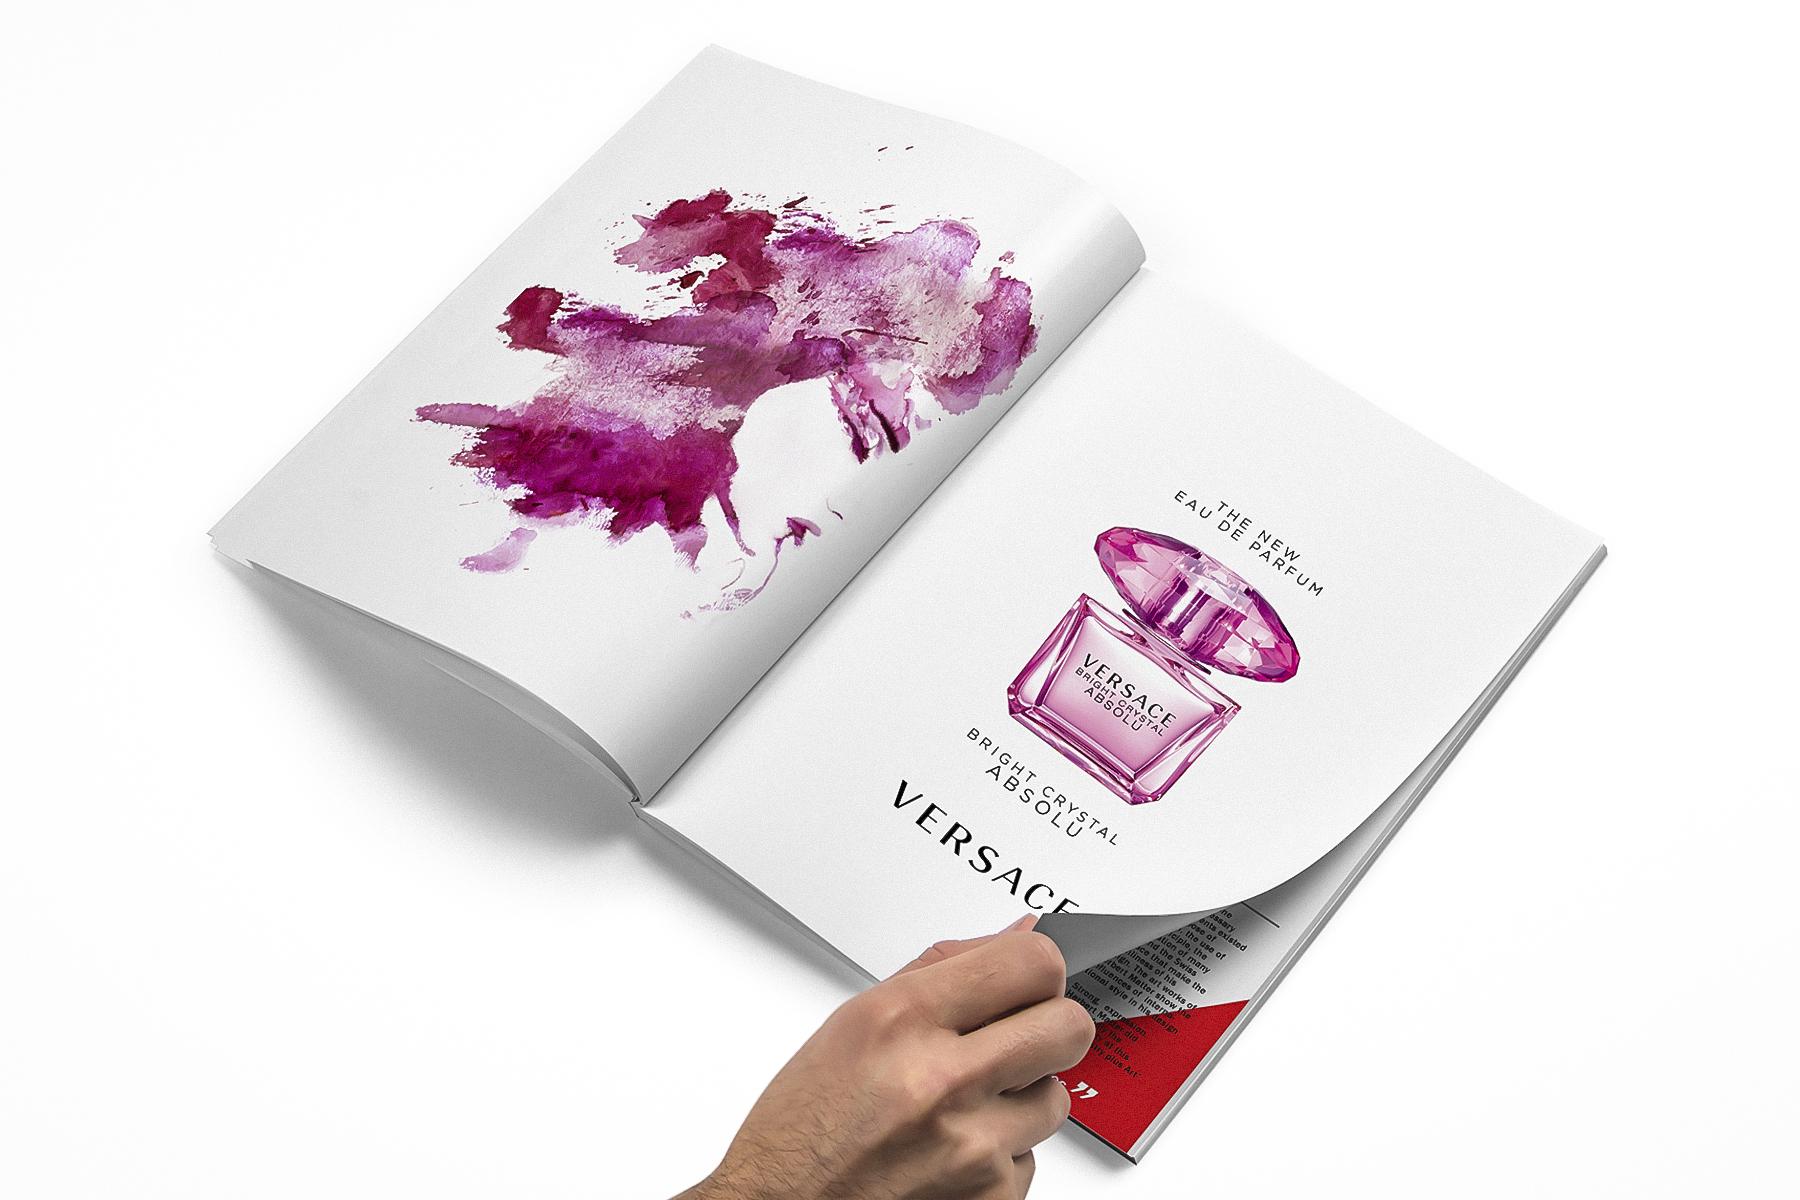 Versace_MagazineSpread_Mockup.jpg